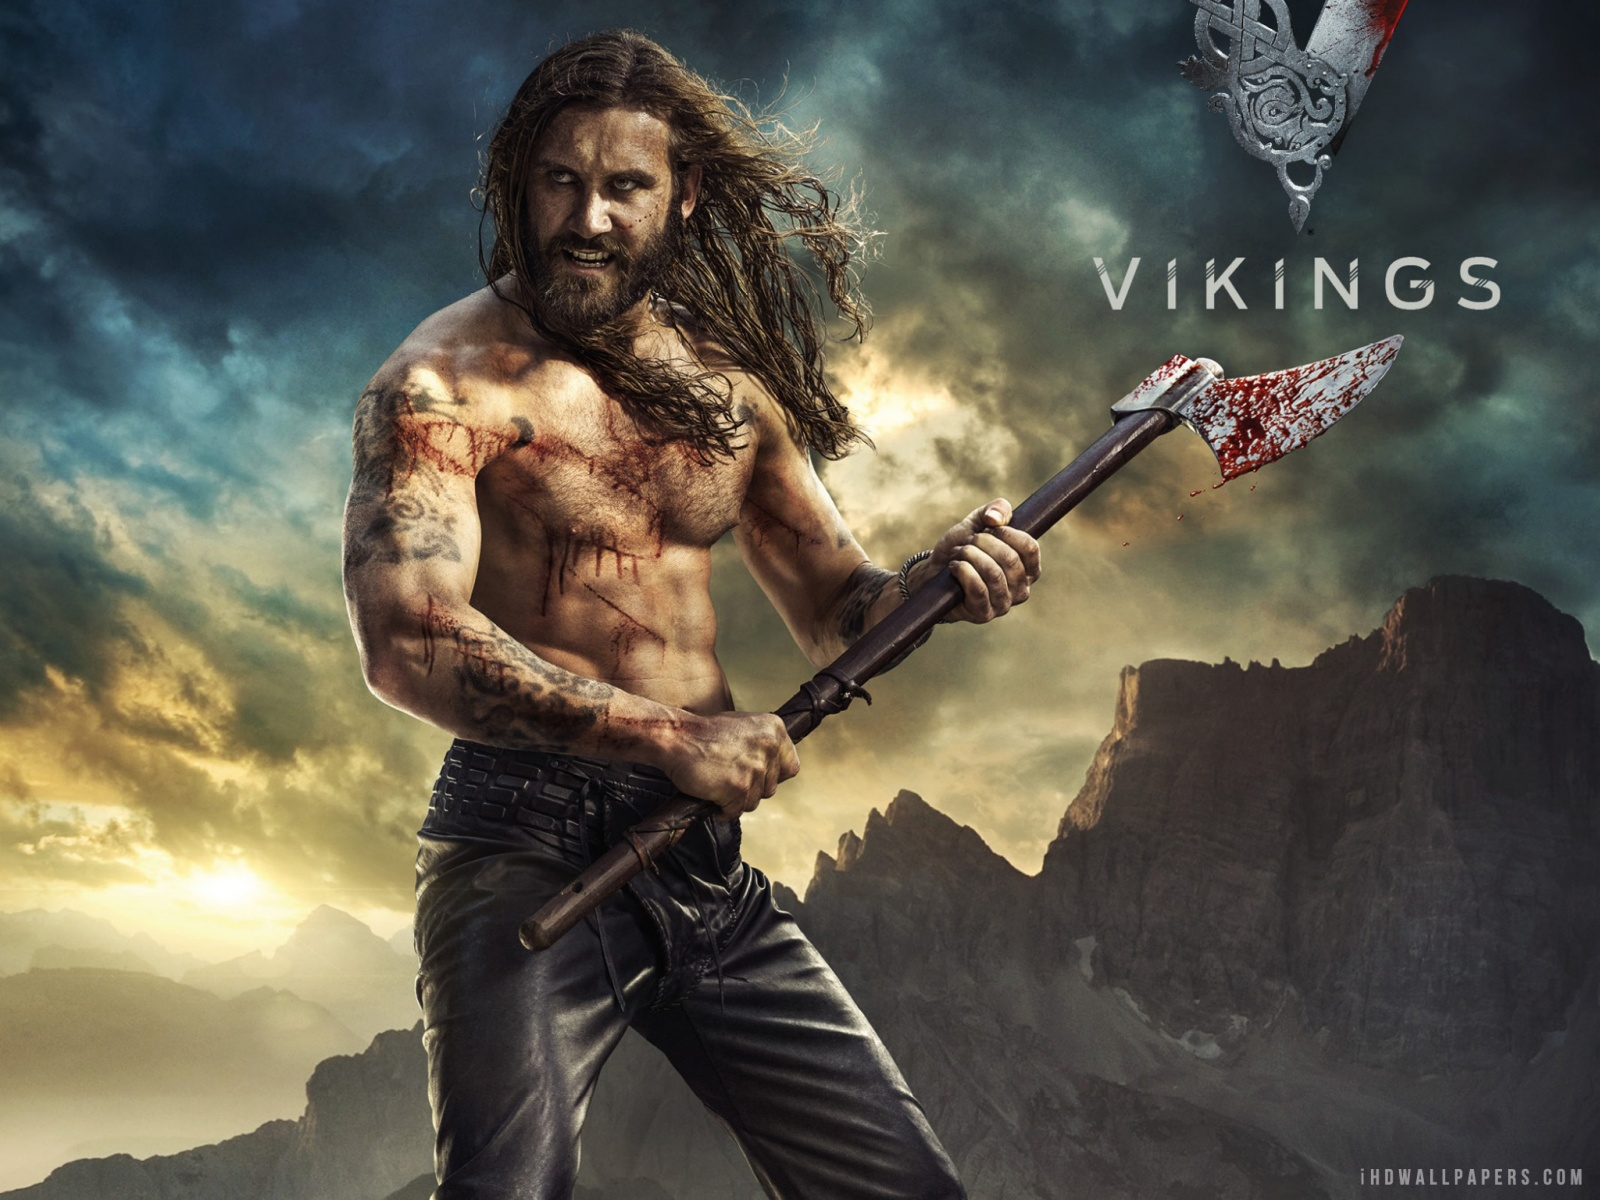 Vikings Wallpaper History Channel hd hd Wallpapers Vikings 1600x1200